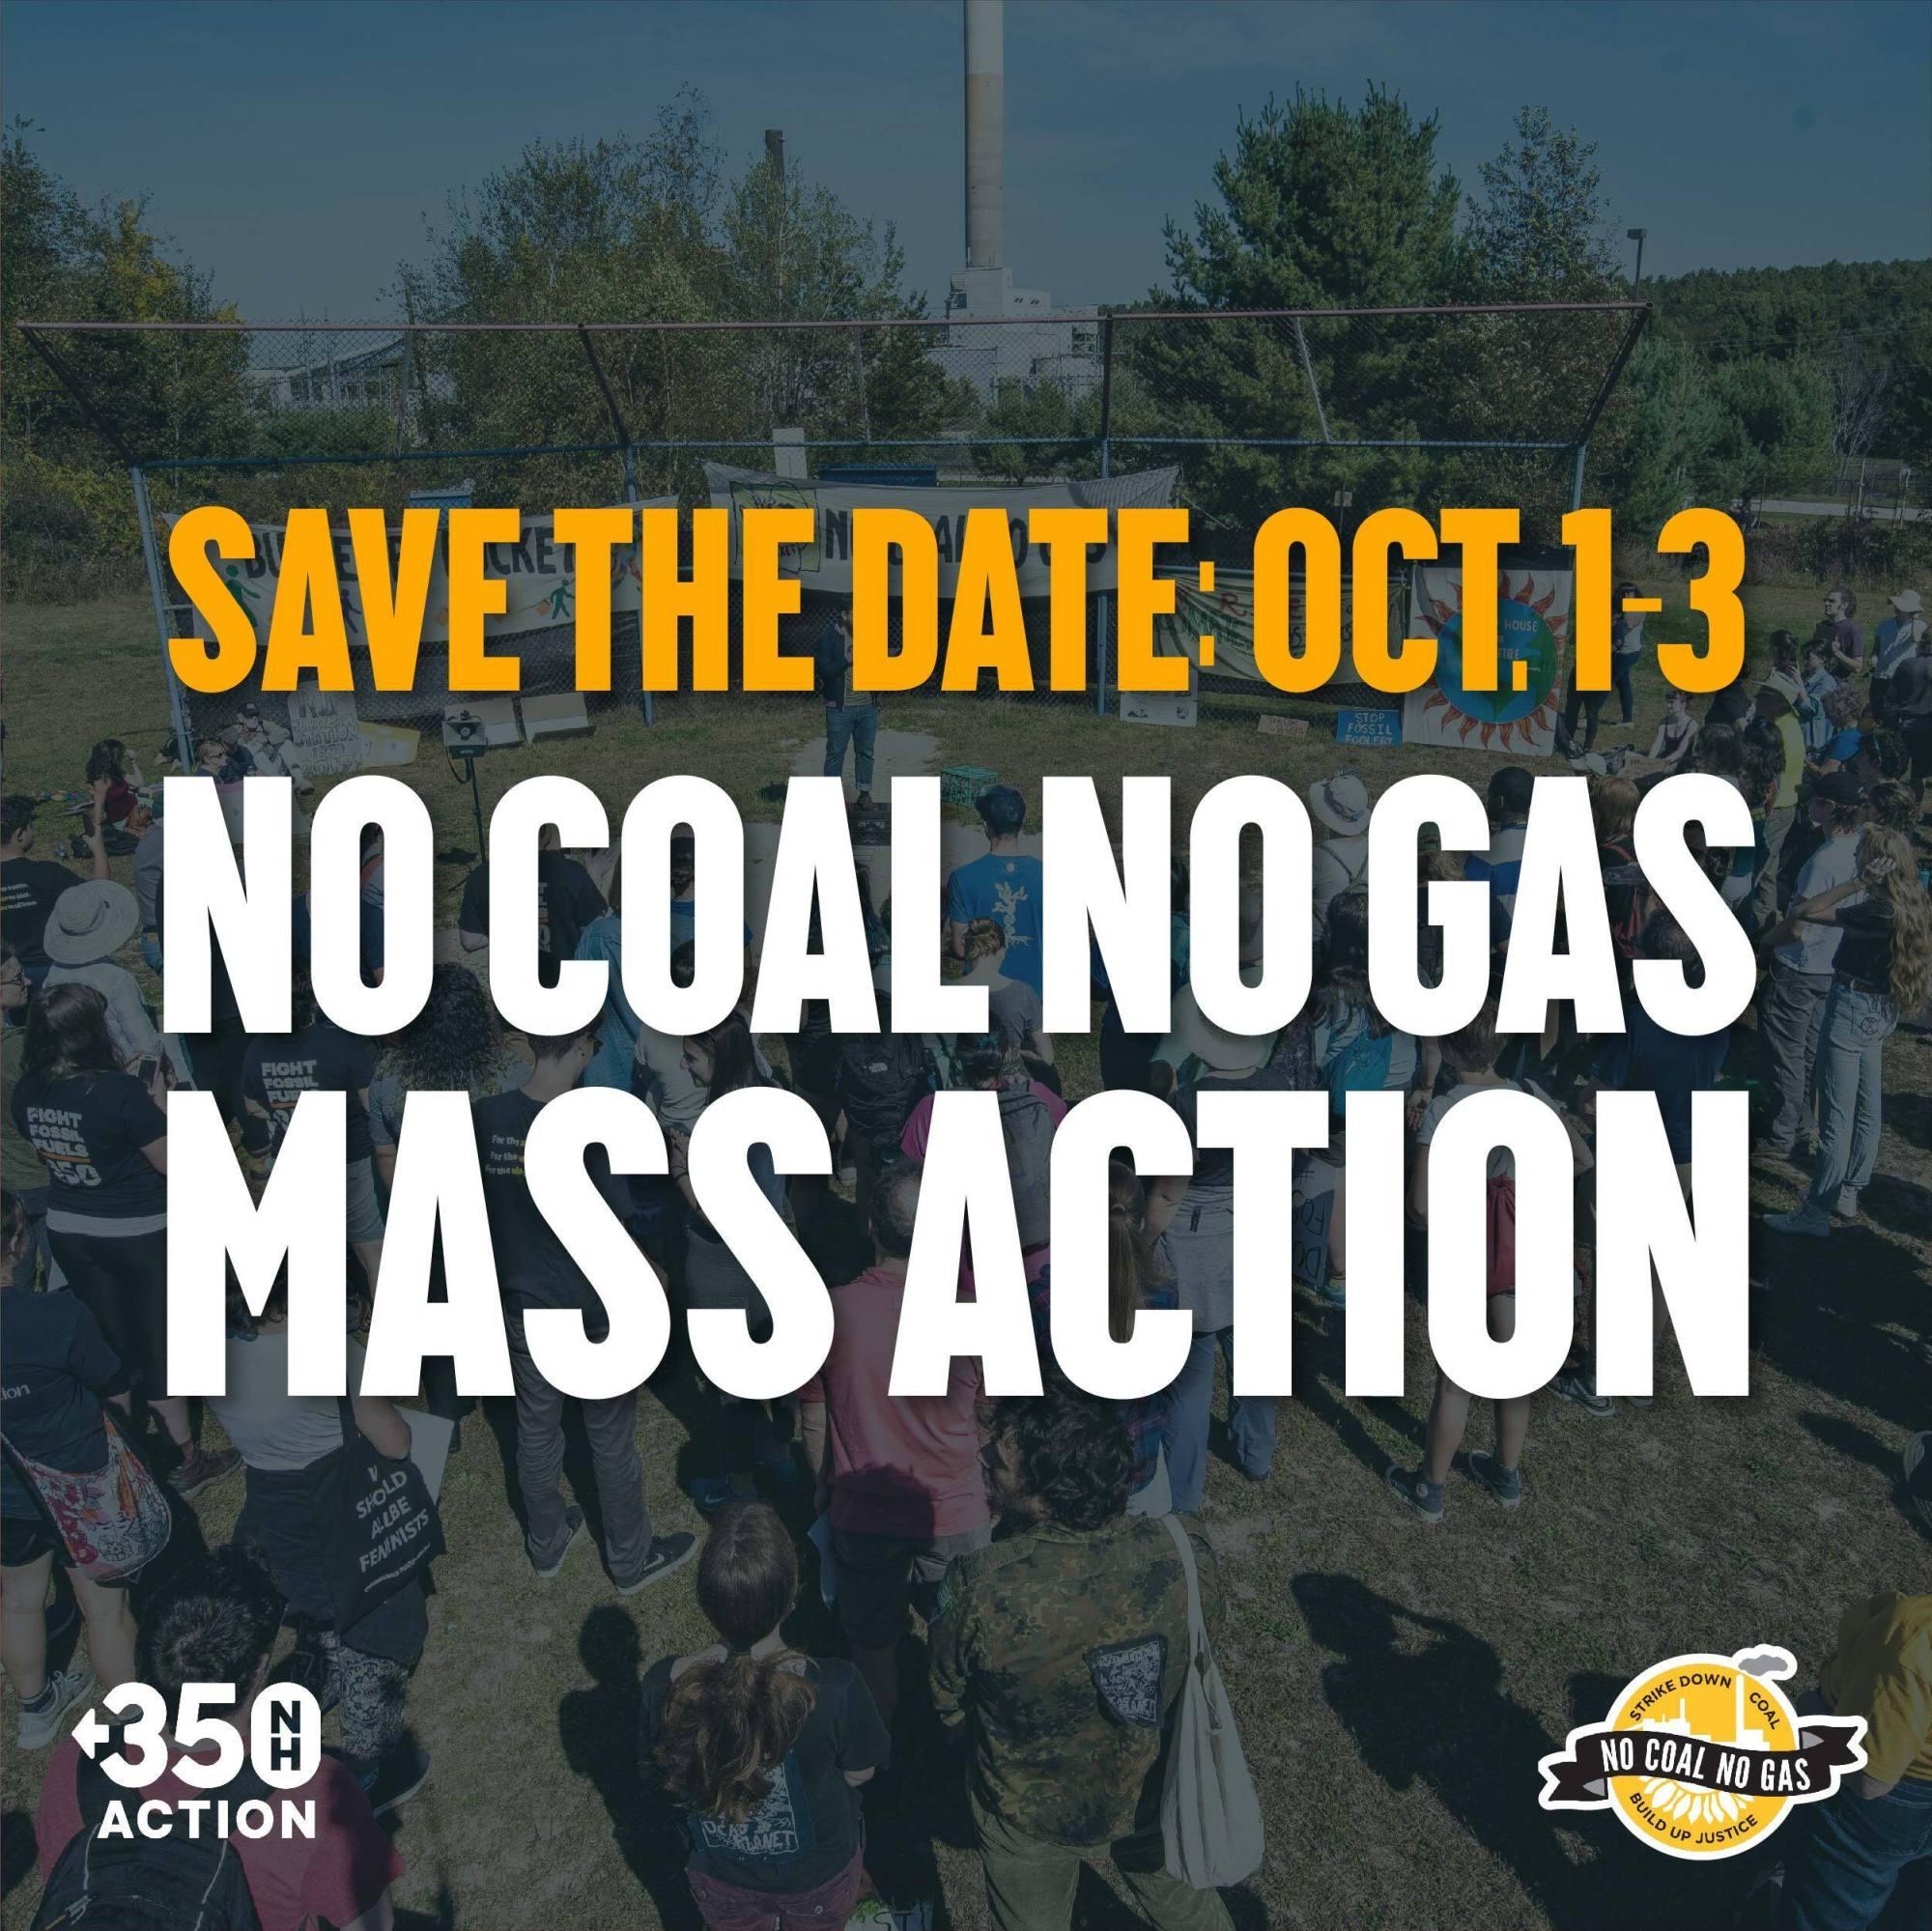 No Coal No Gas Mass actionOct 2021